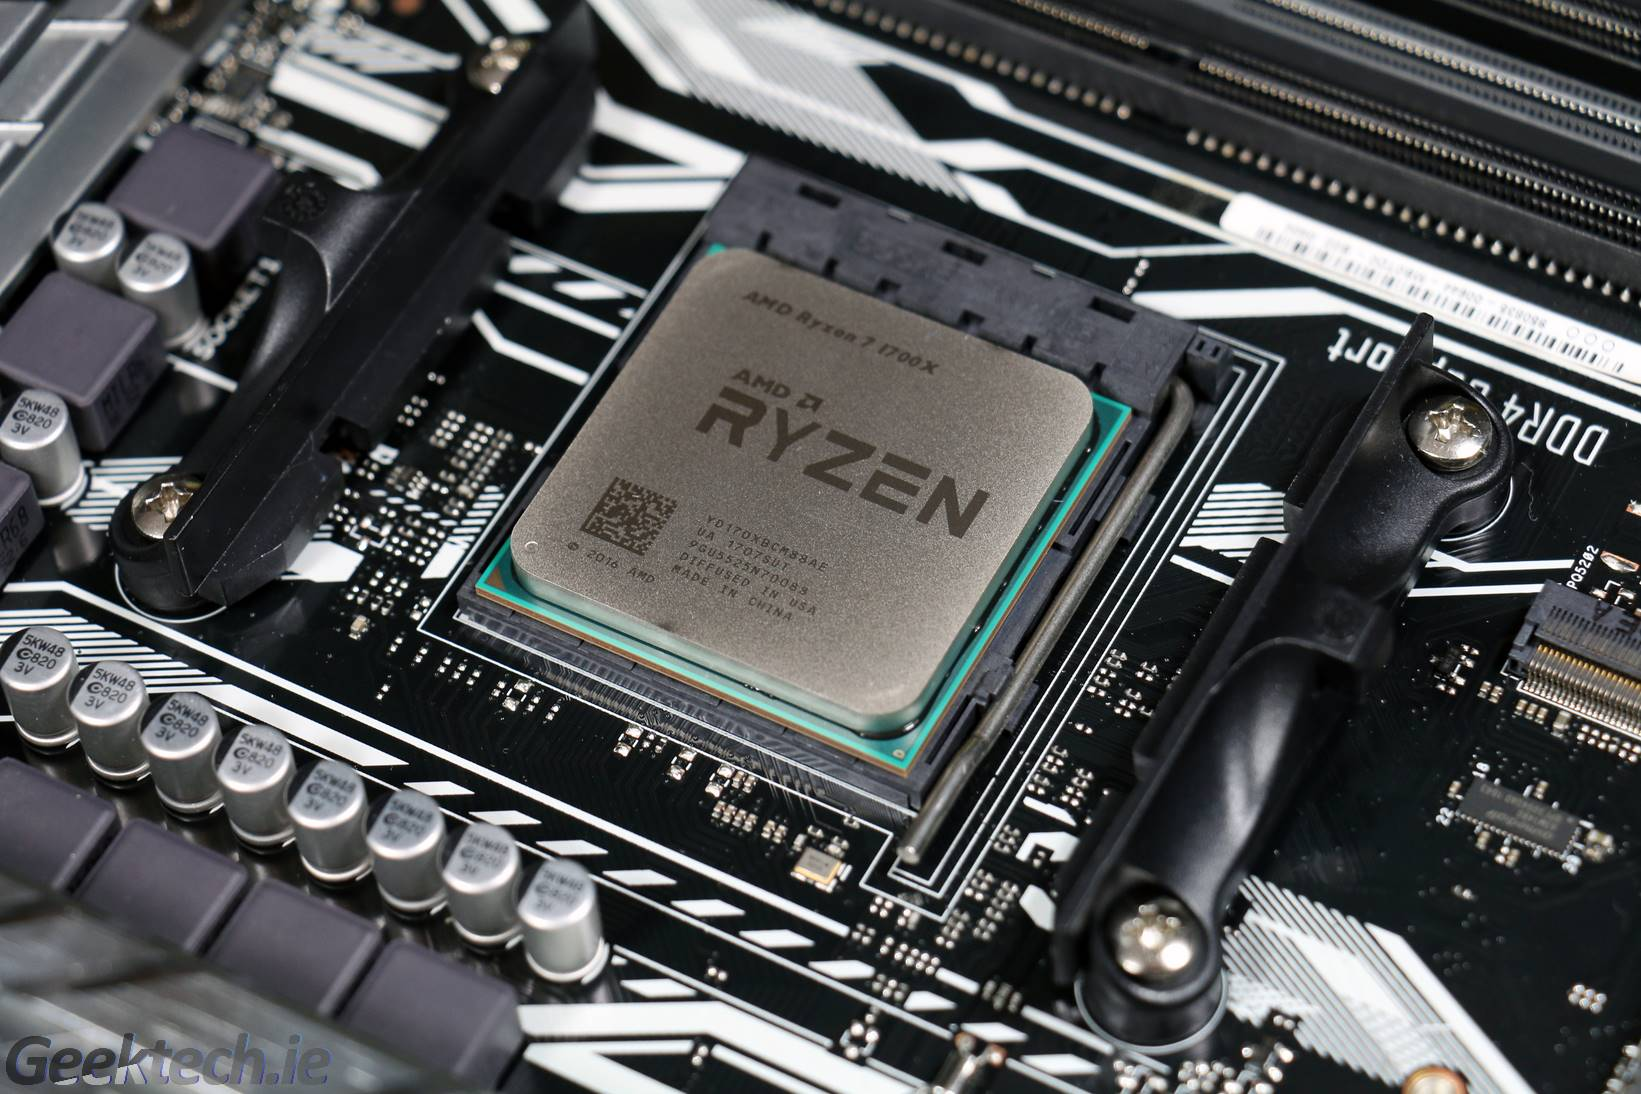 Review Amd Ryzen 7 1700x Geektech Ie